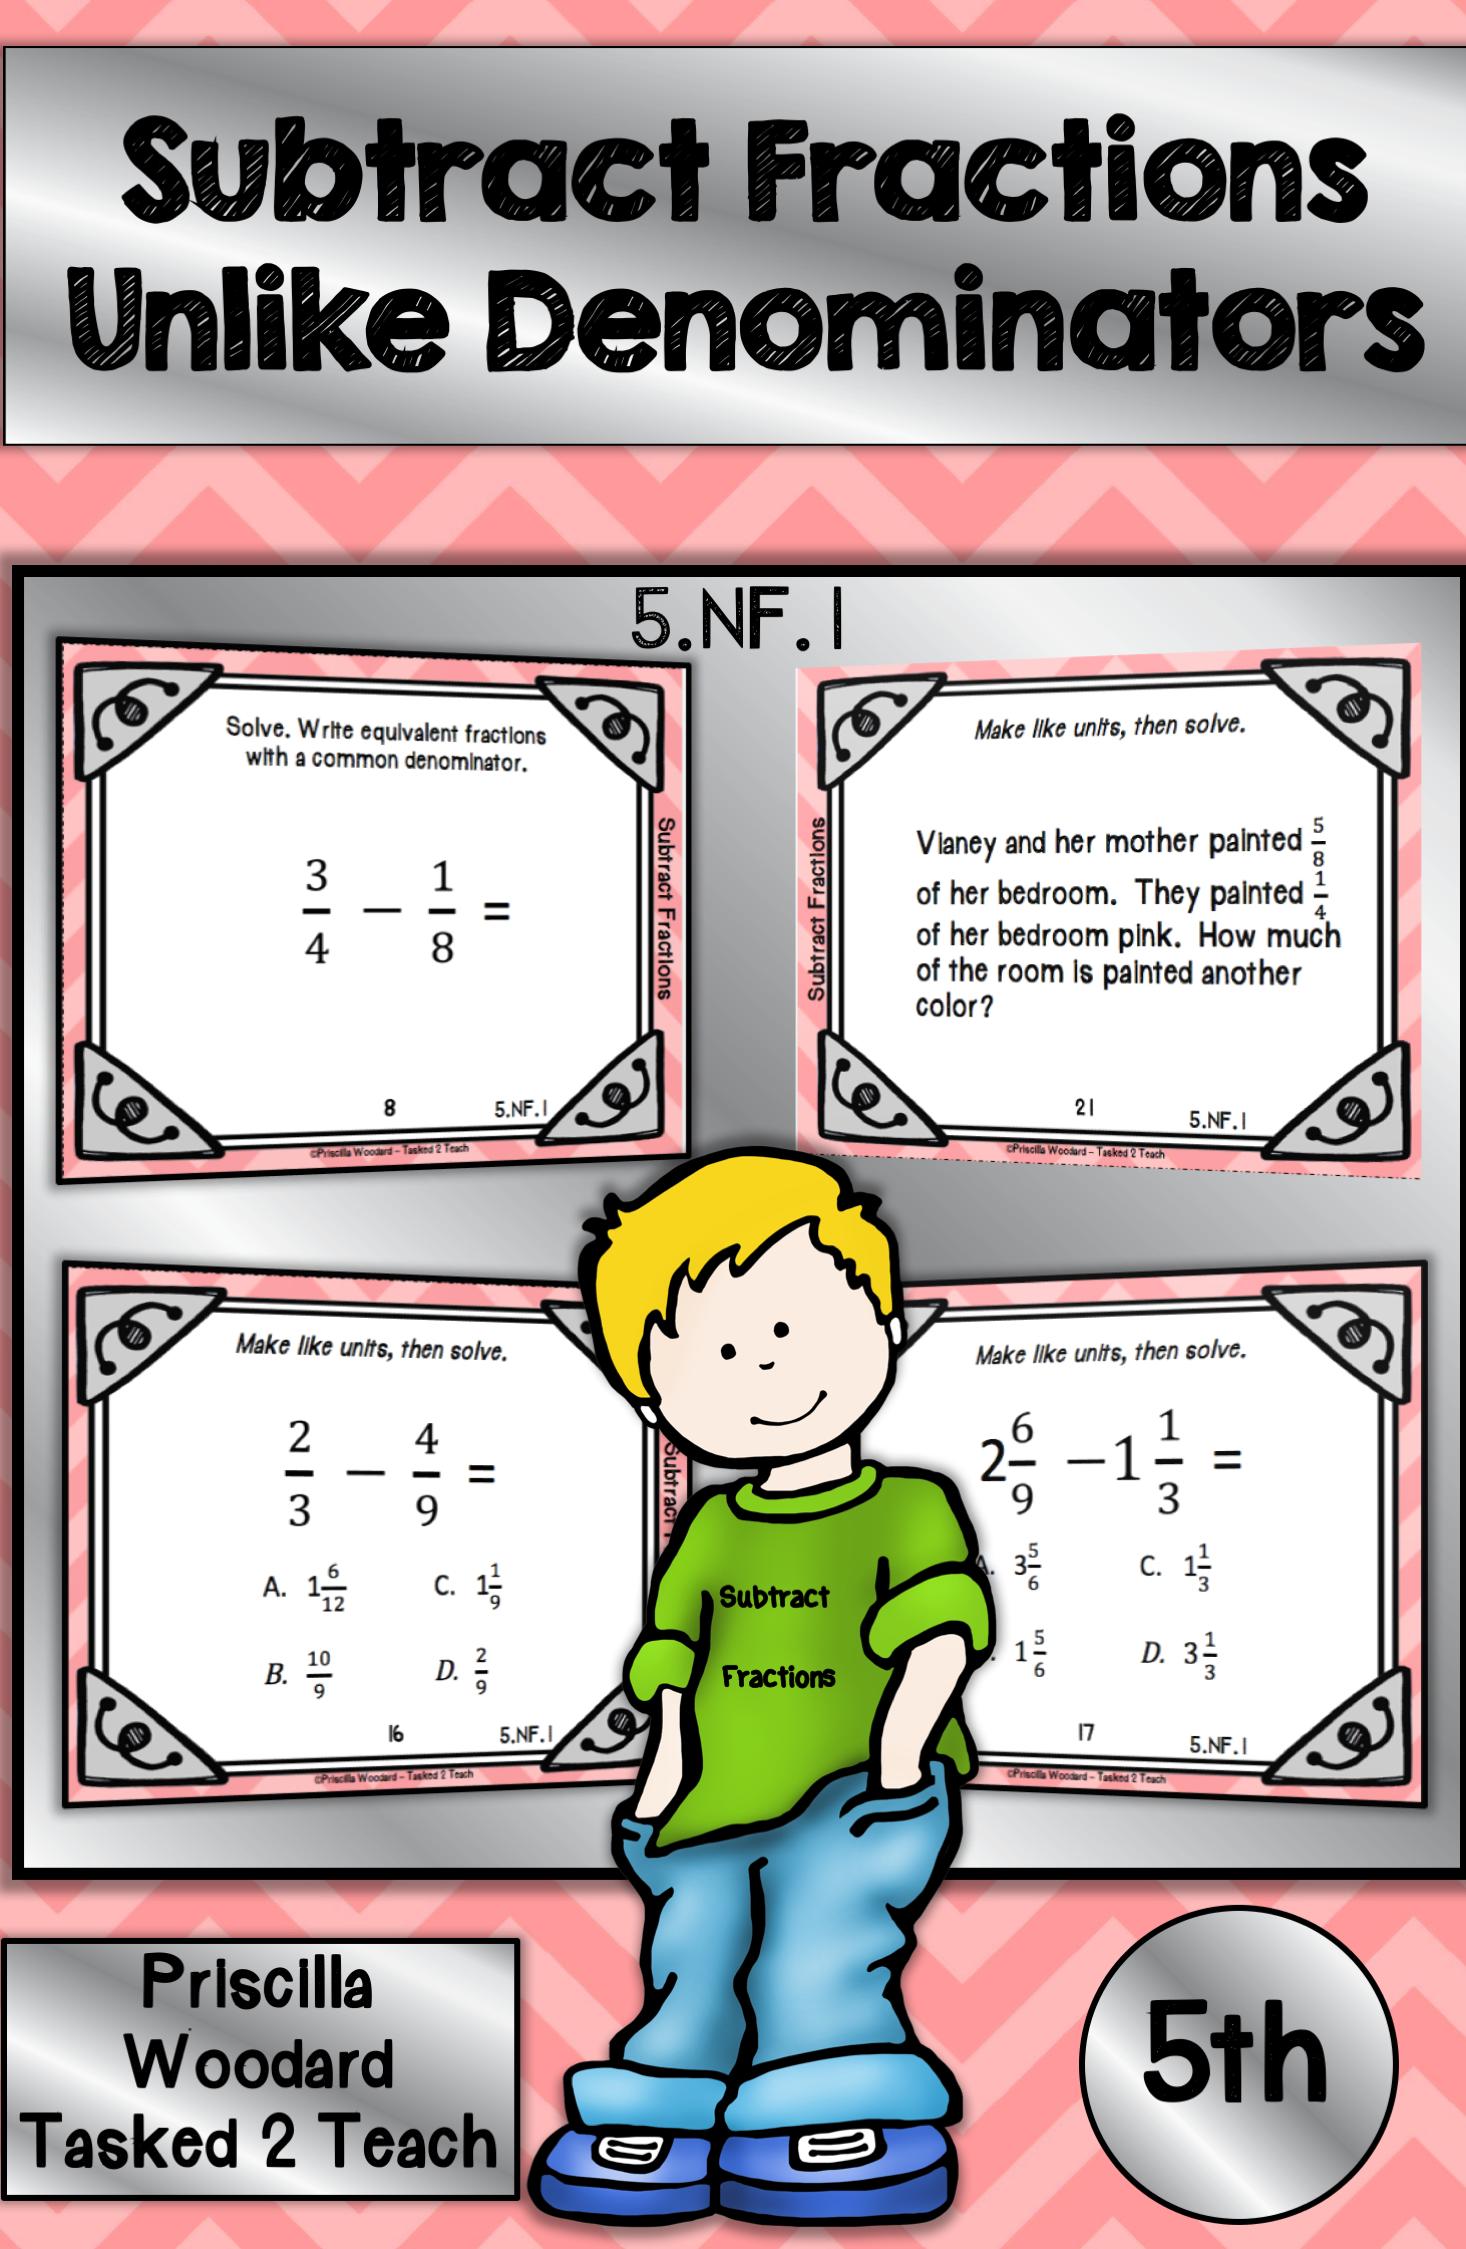 Subtract Fractions With Unlike Denominators 5th Grade